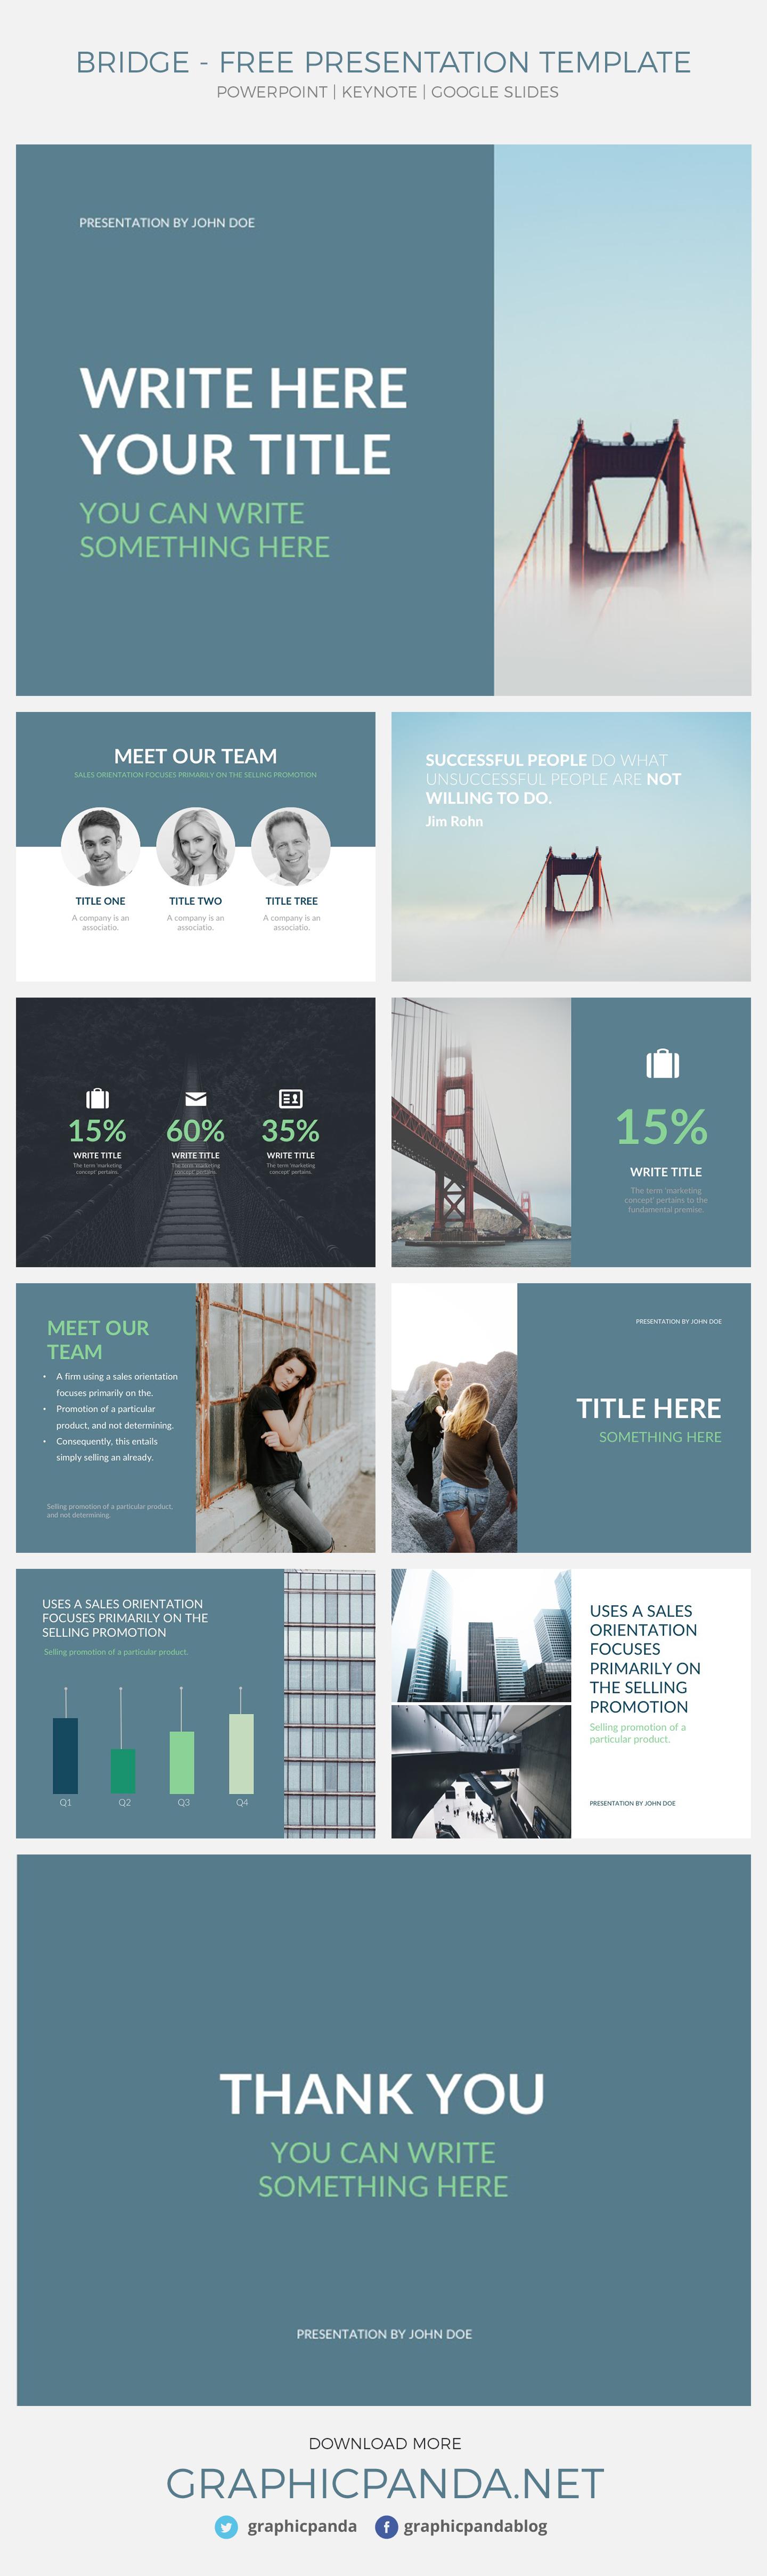 Bridge Presentation Template - Powerpoint, Keynote, Google Slides